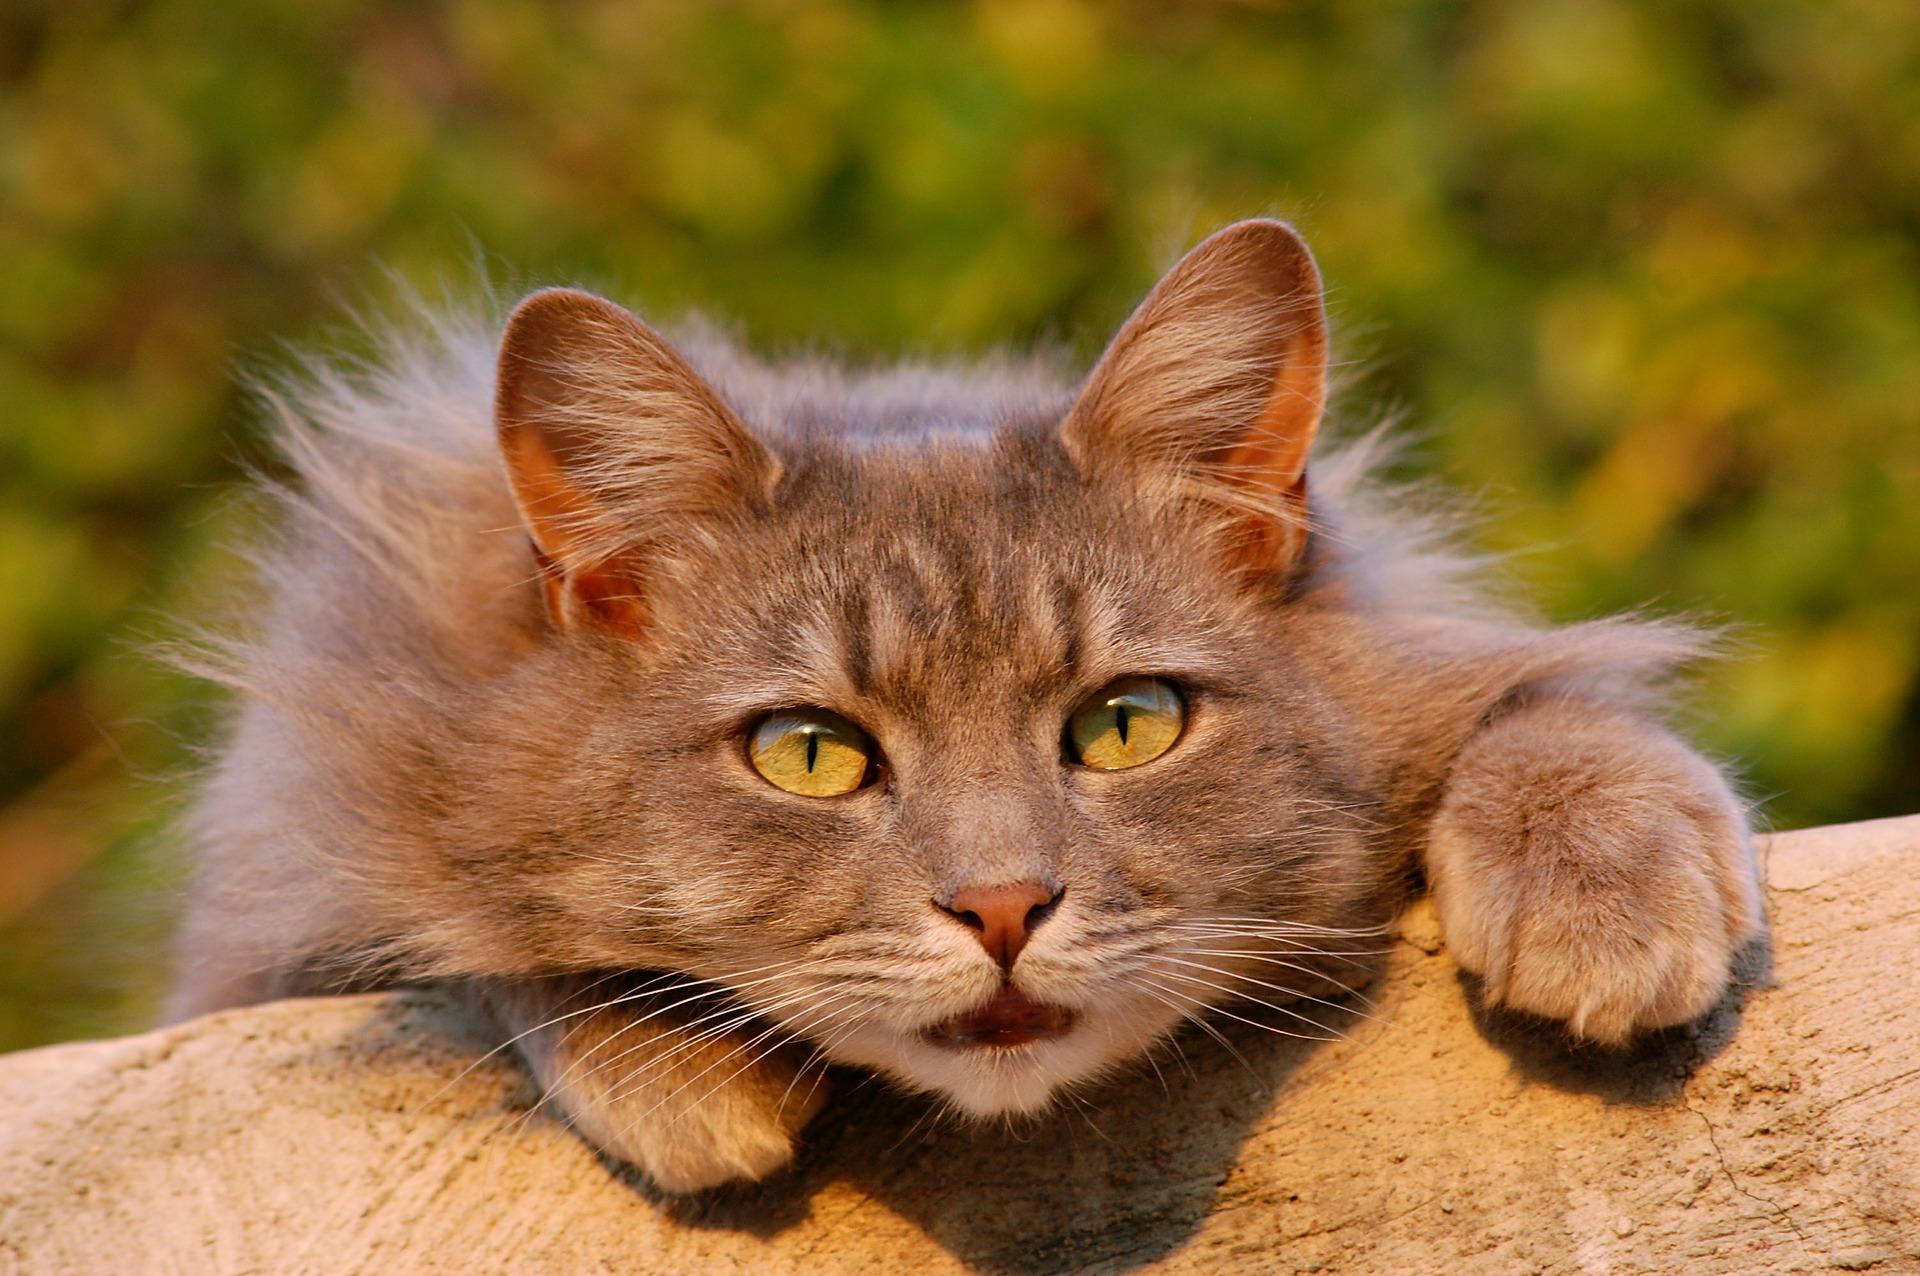 cat-401124_1920.jpg